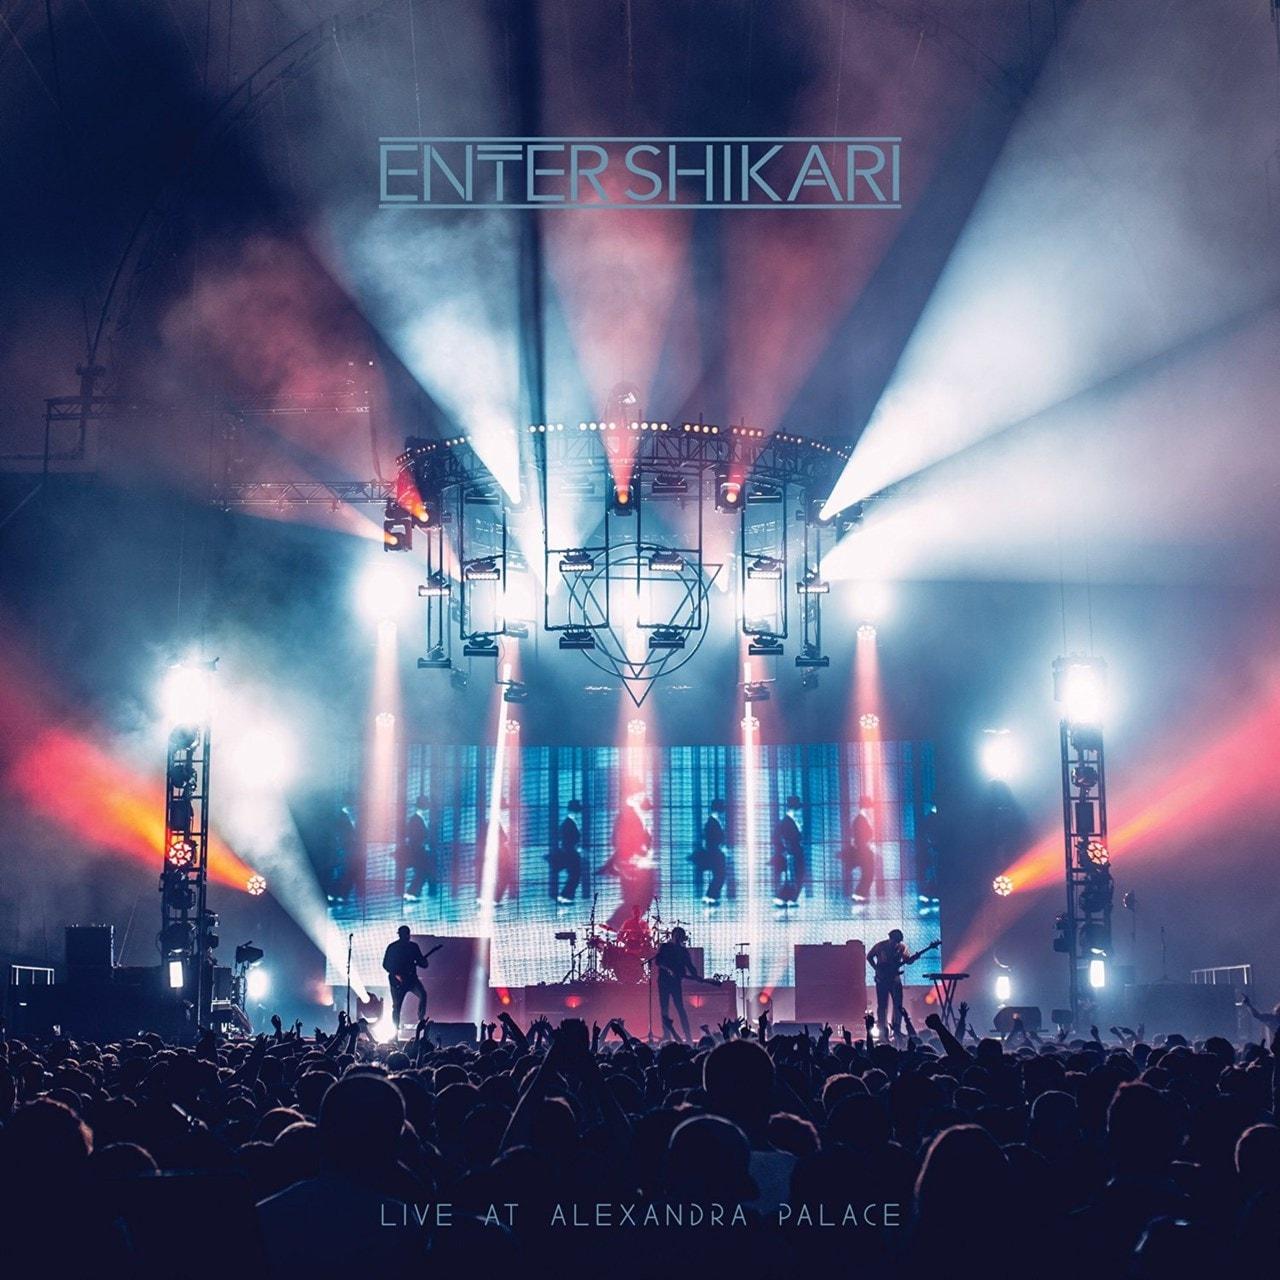 Live at Alexandra Palace - 1